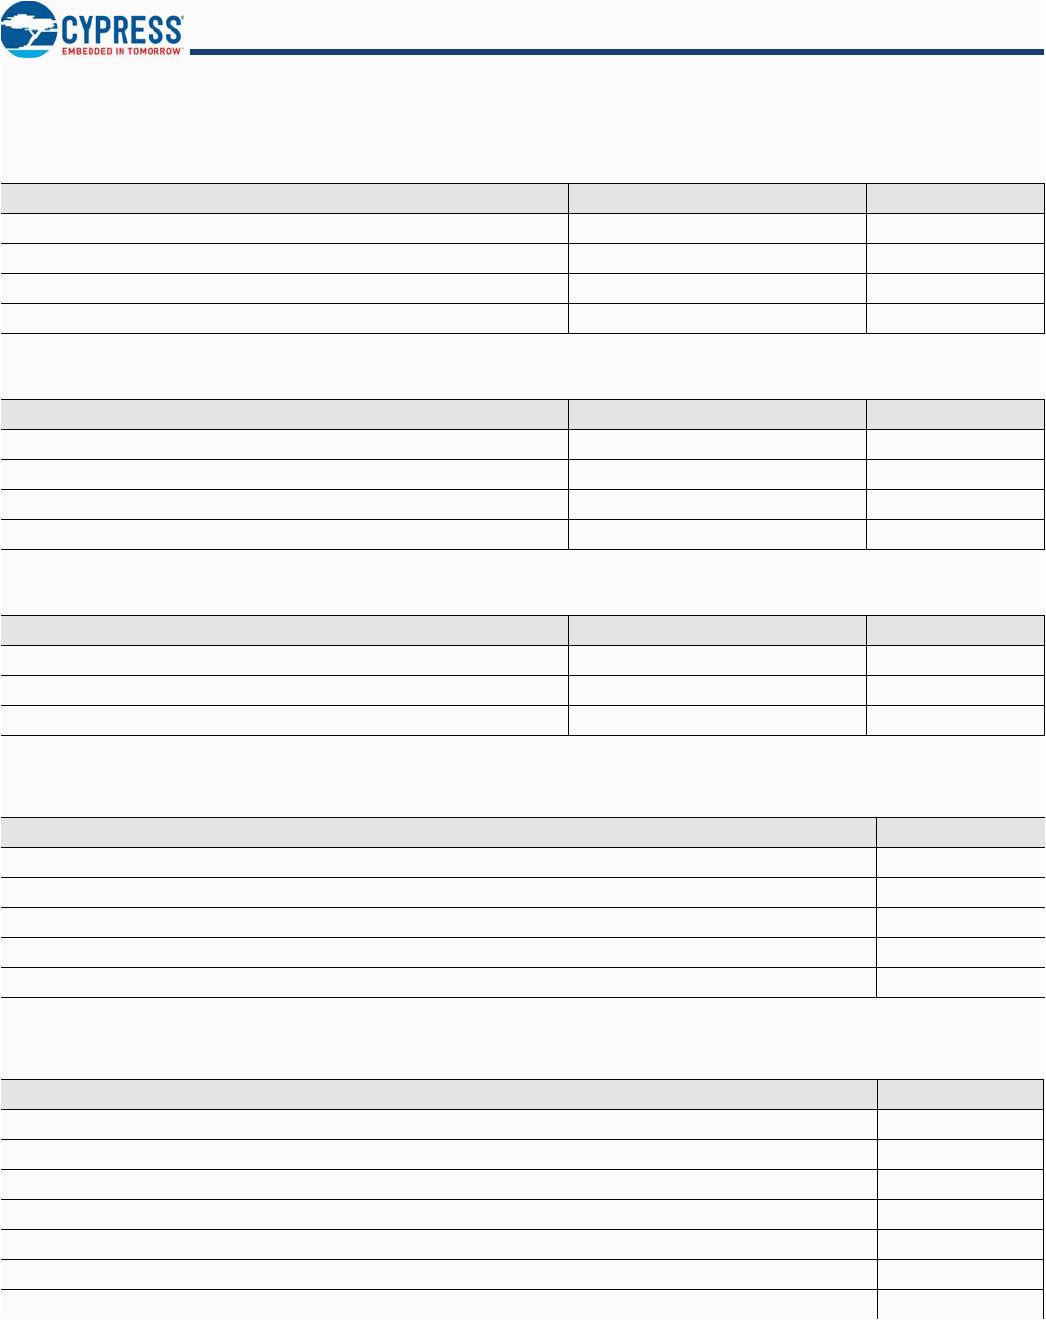 s25fl128s 256s datasheet cypress semiconductor digikey